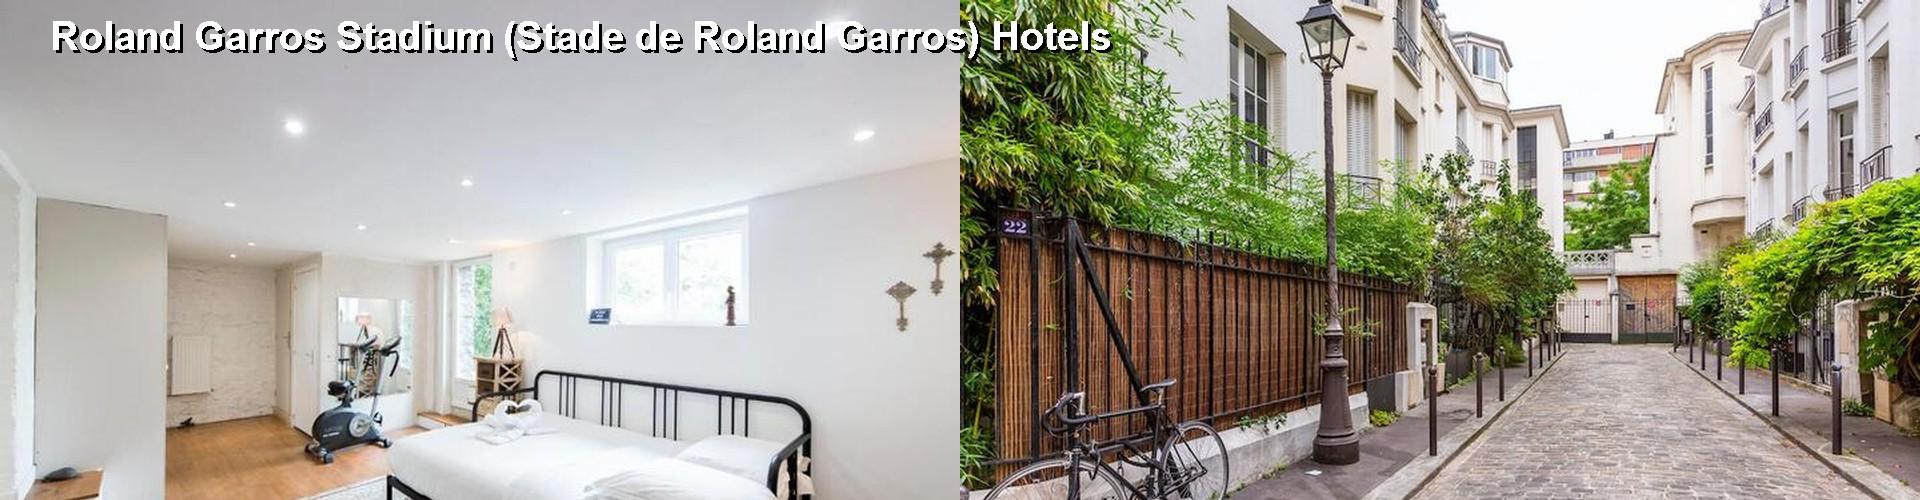 Star Hotels Near Roland Garros